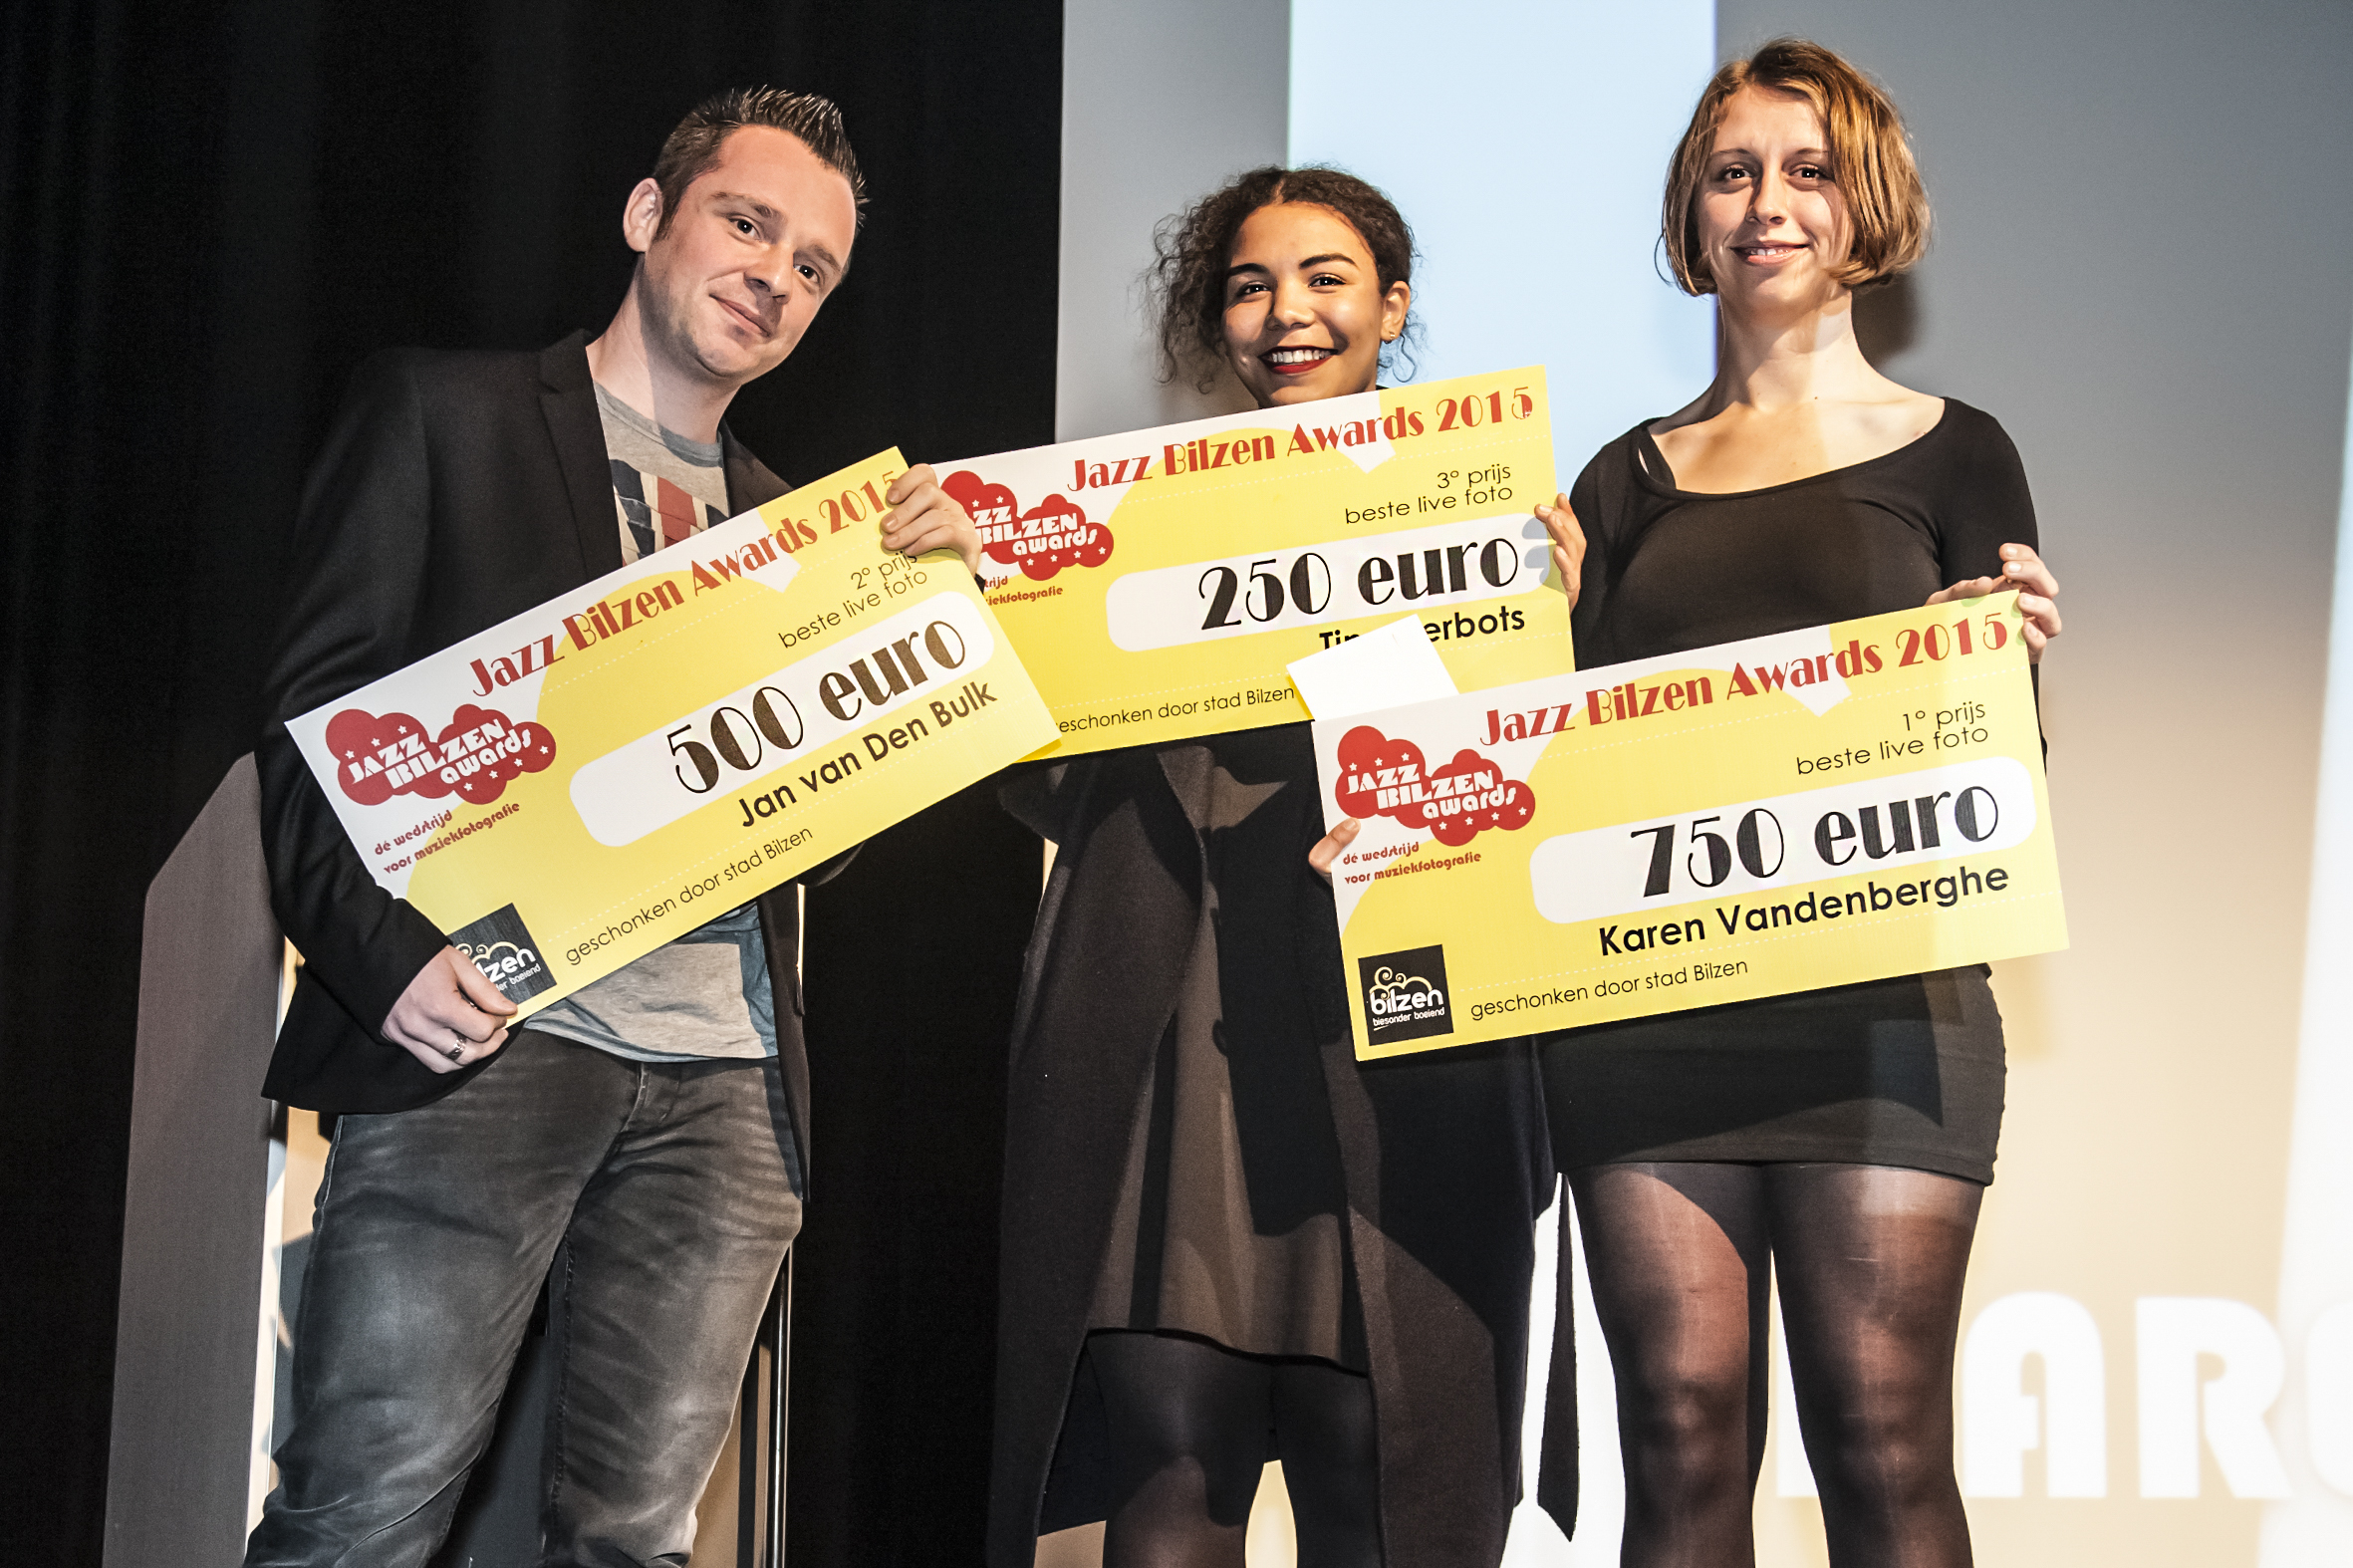 Awards Â« jazz bilzen awards